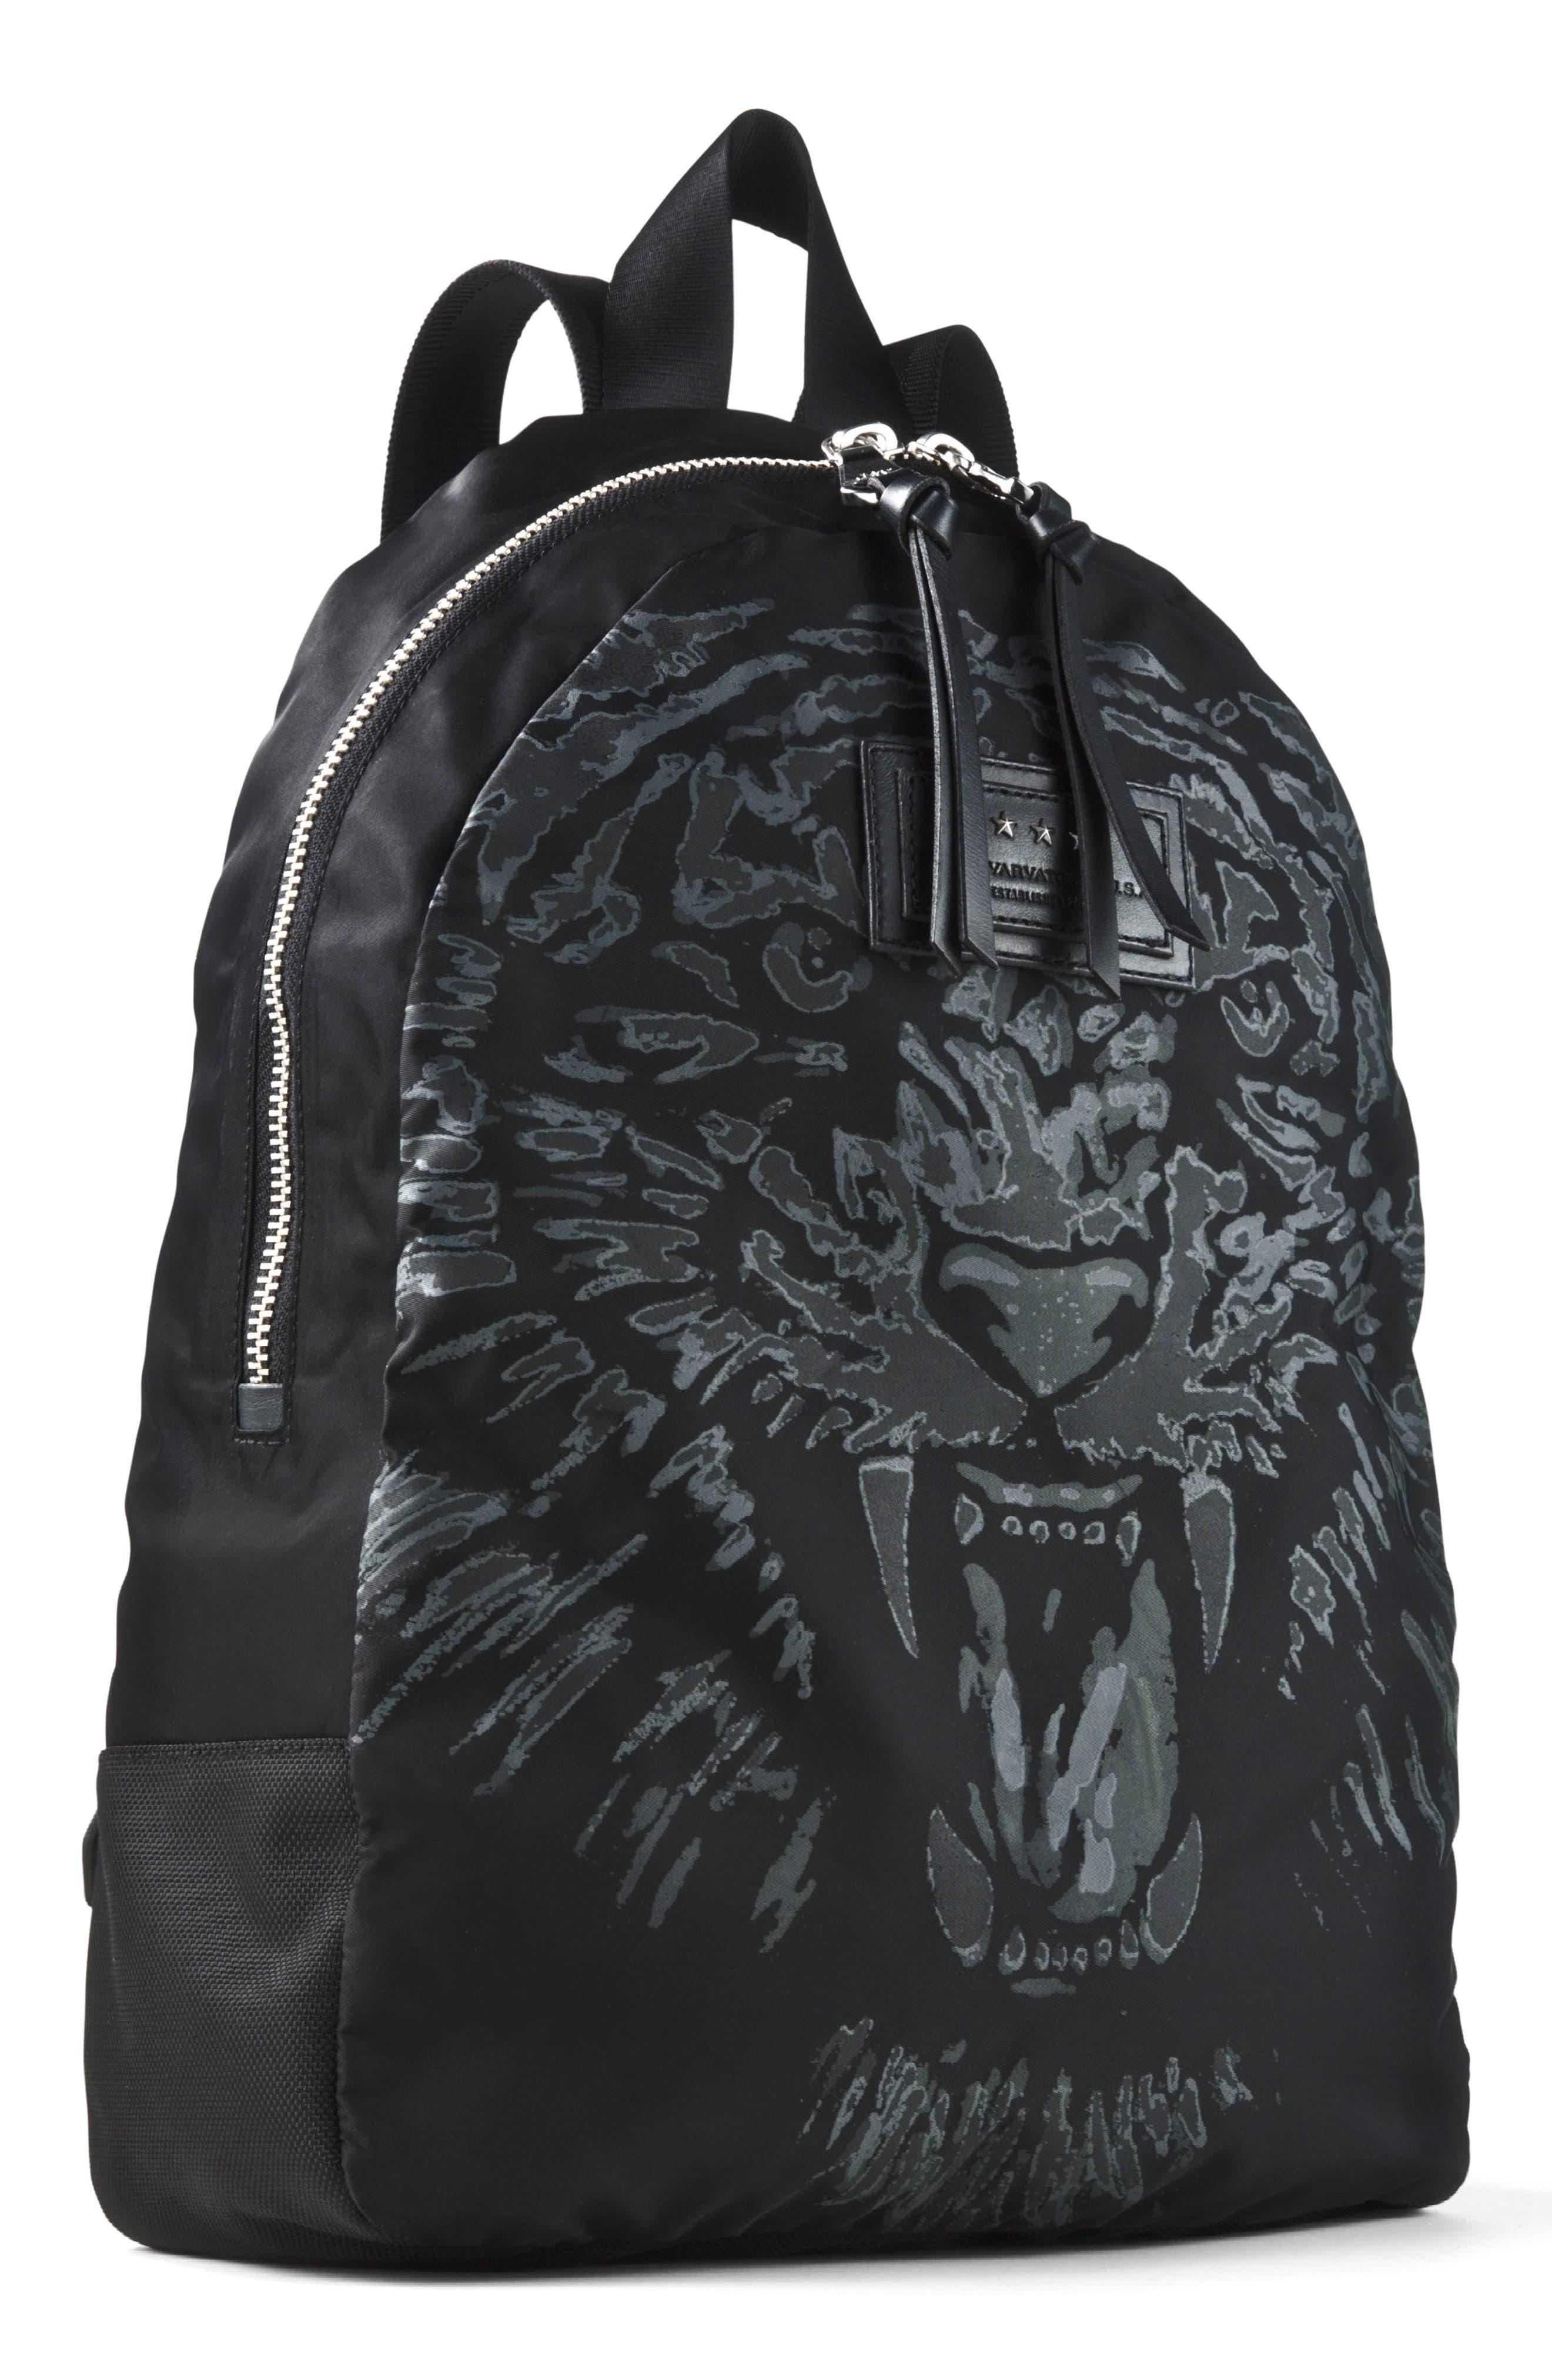 Tiger Print Backpack,                         Main,                         color, 001